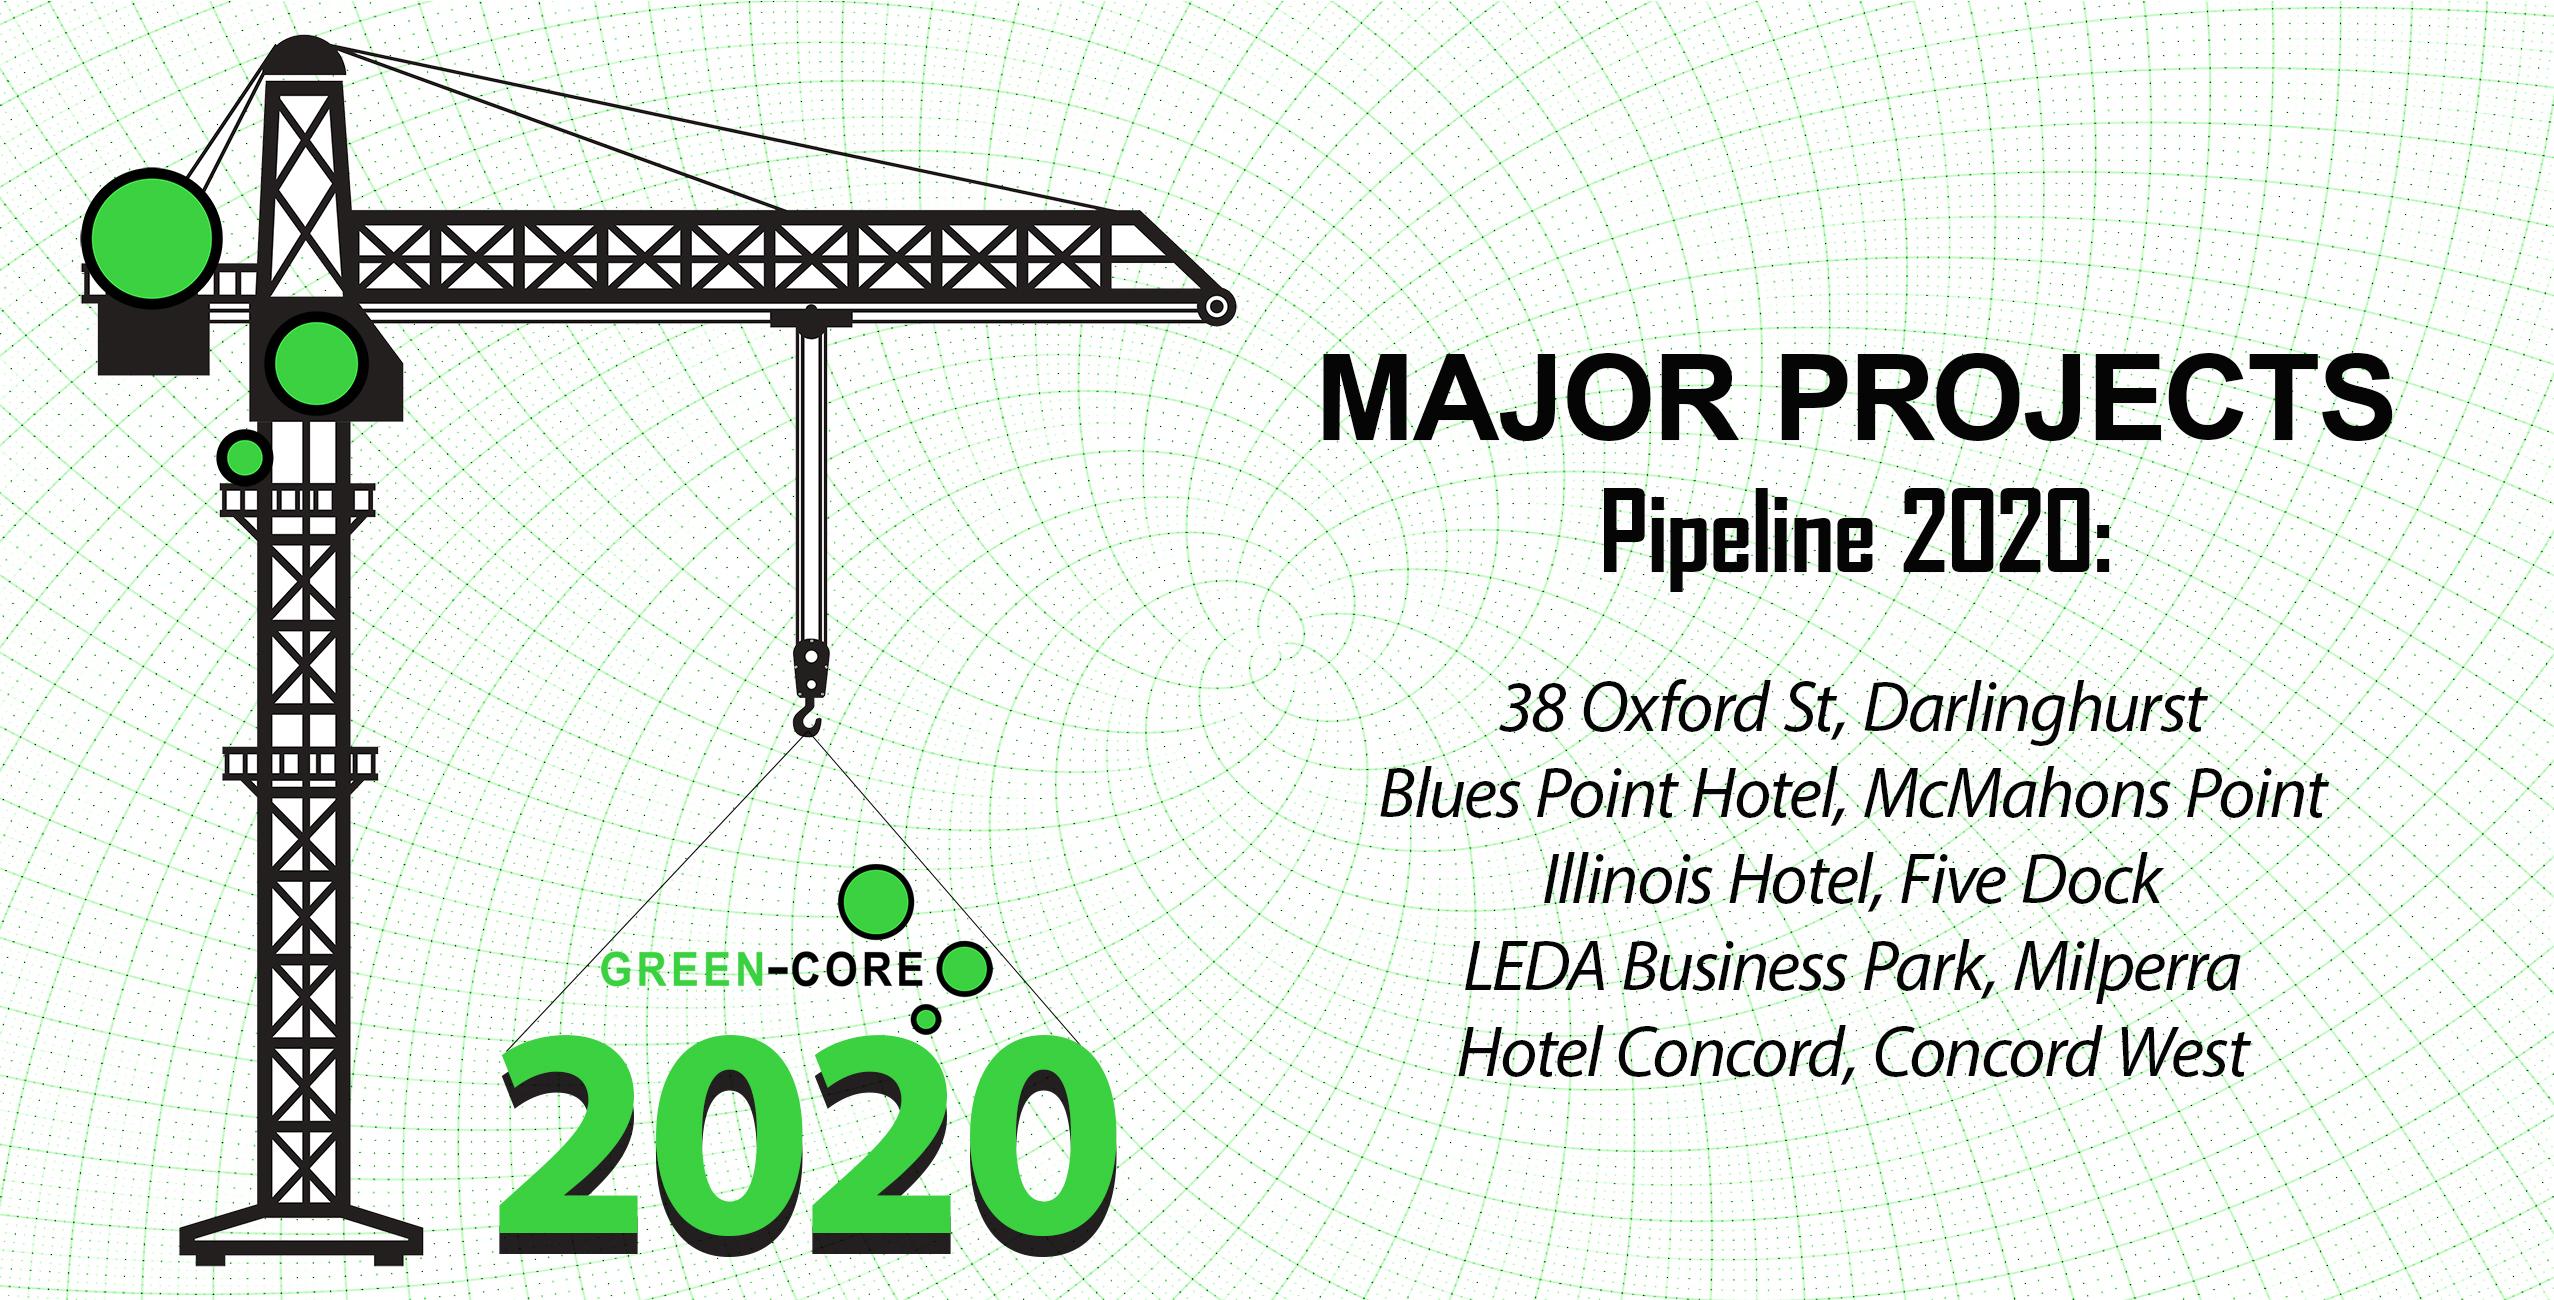 Pipeline 2020 U